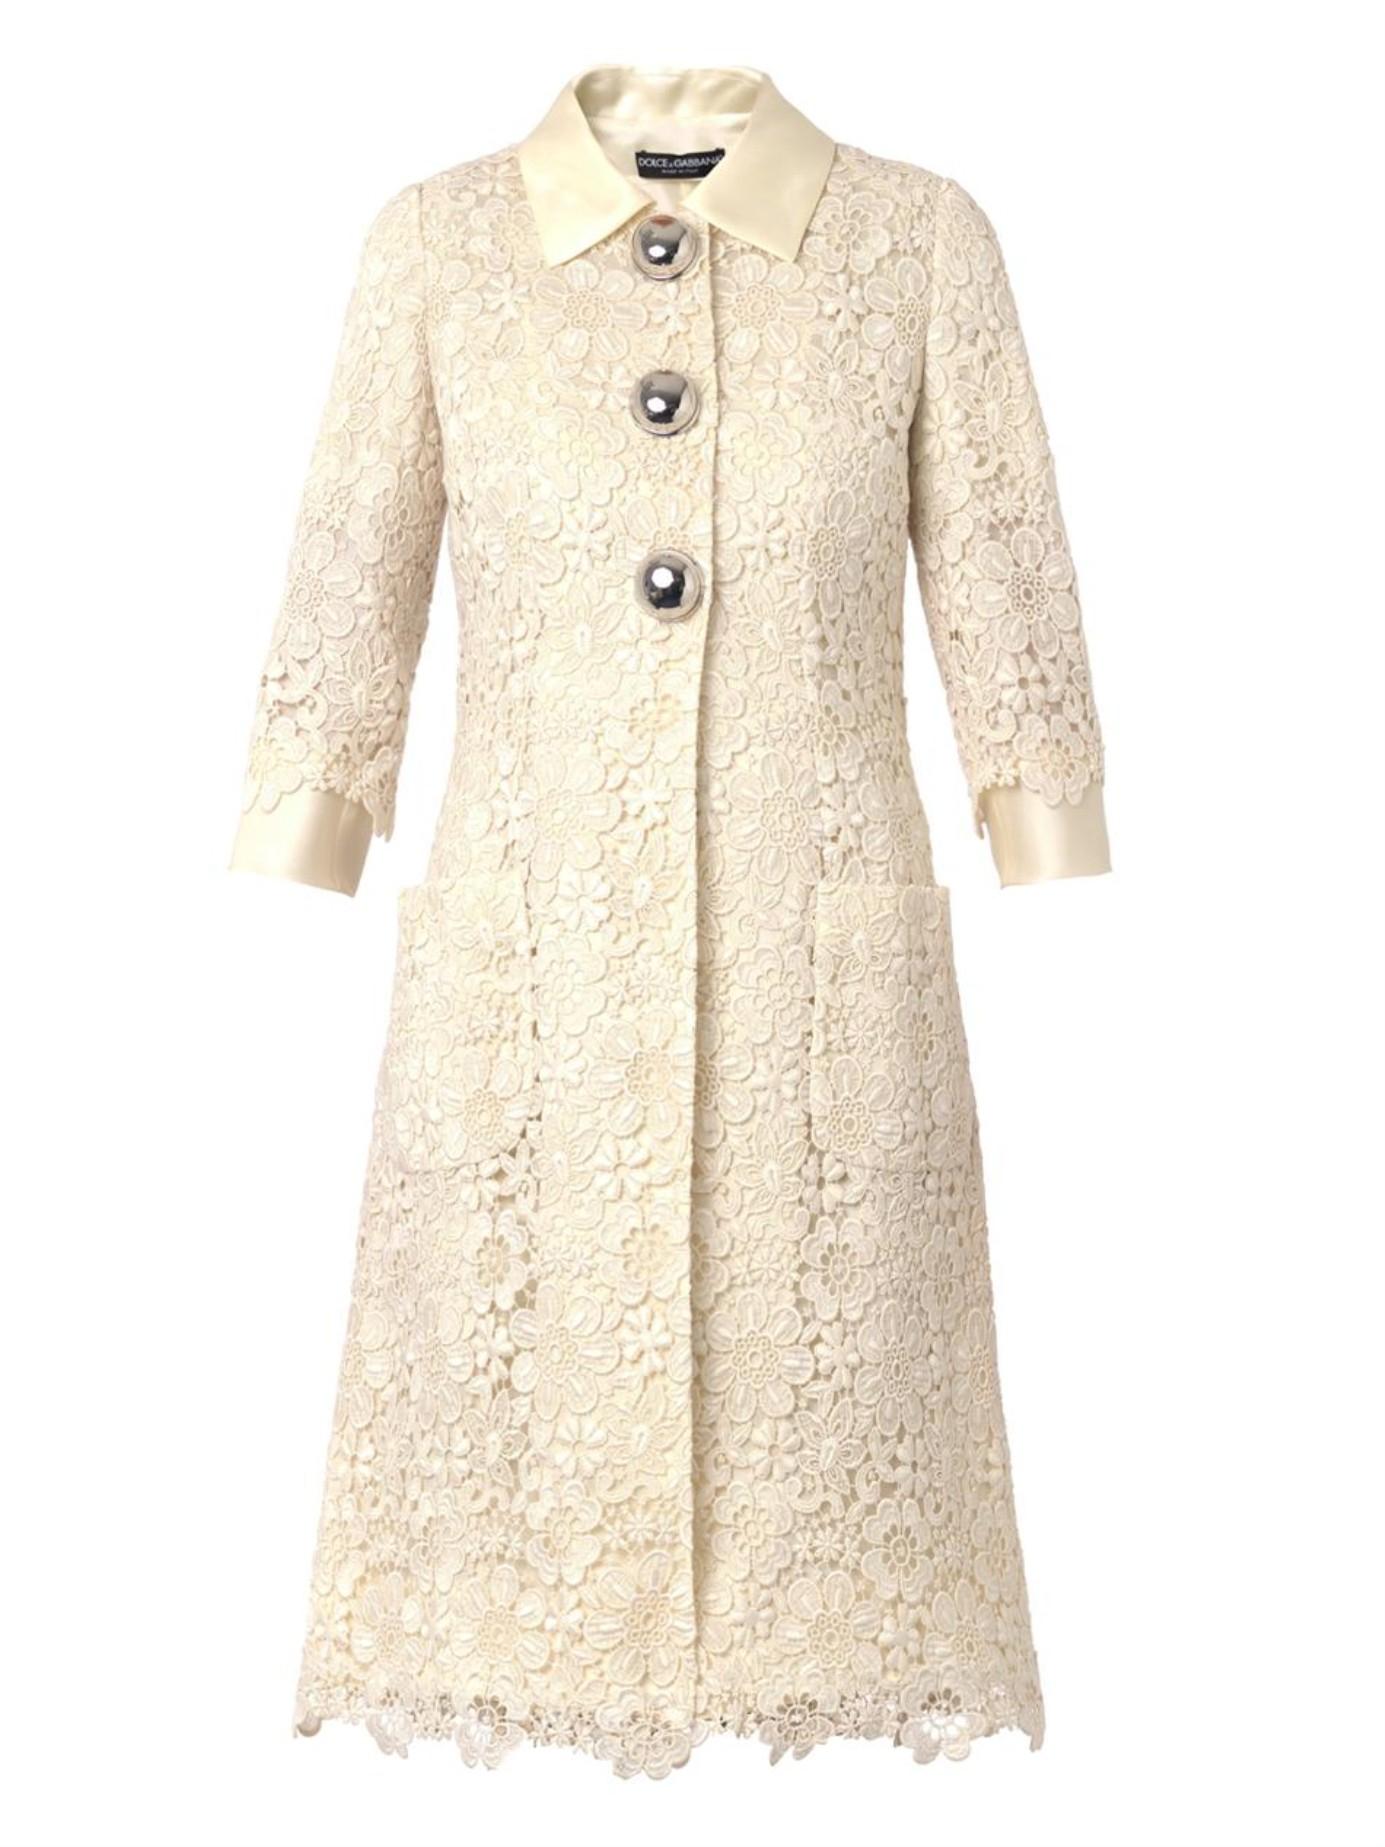 cd4ce1857d820 Lyst - Dolce   Gabbana Macramé Lace Coat in Natural